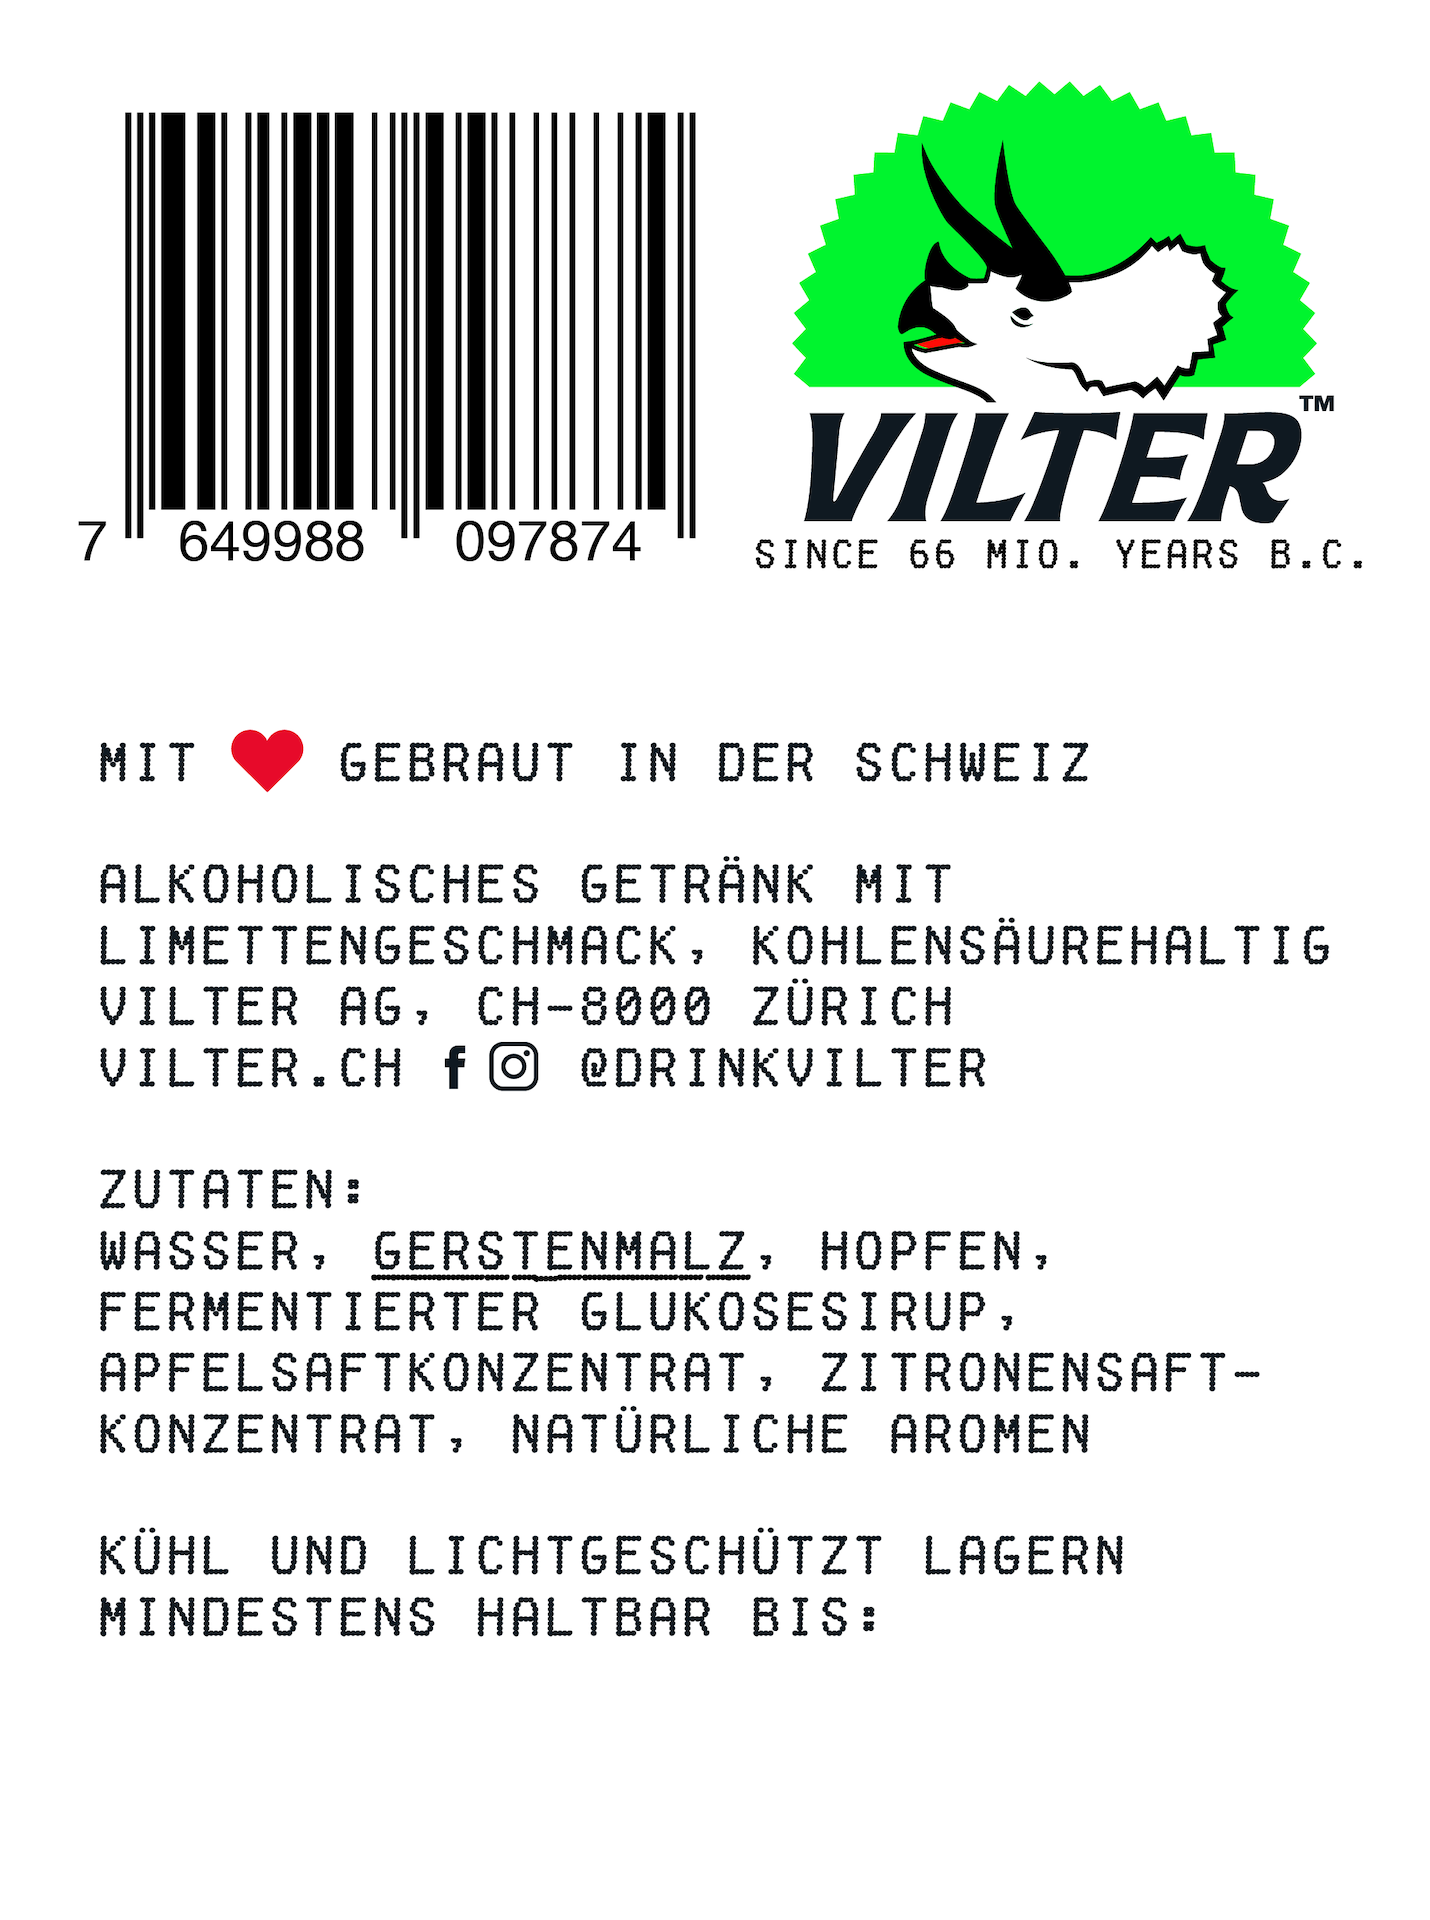 VILTER Hard Seltzer Juicy Lime